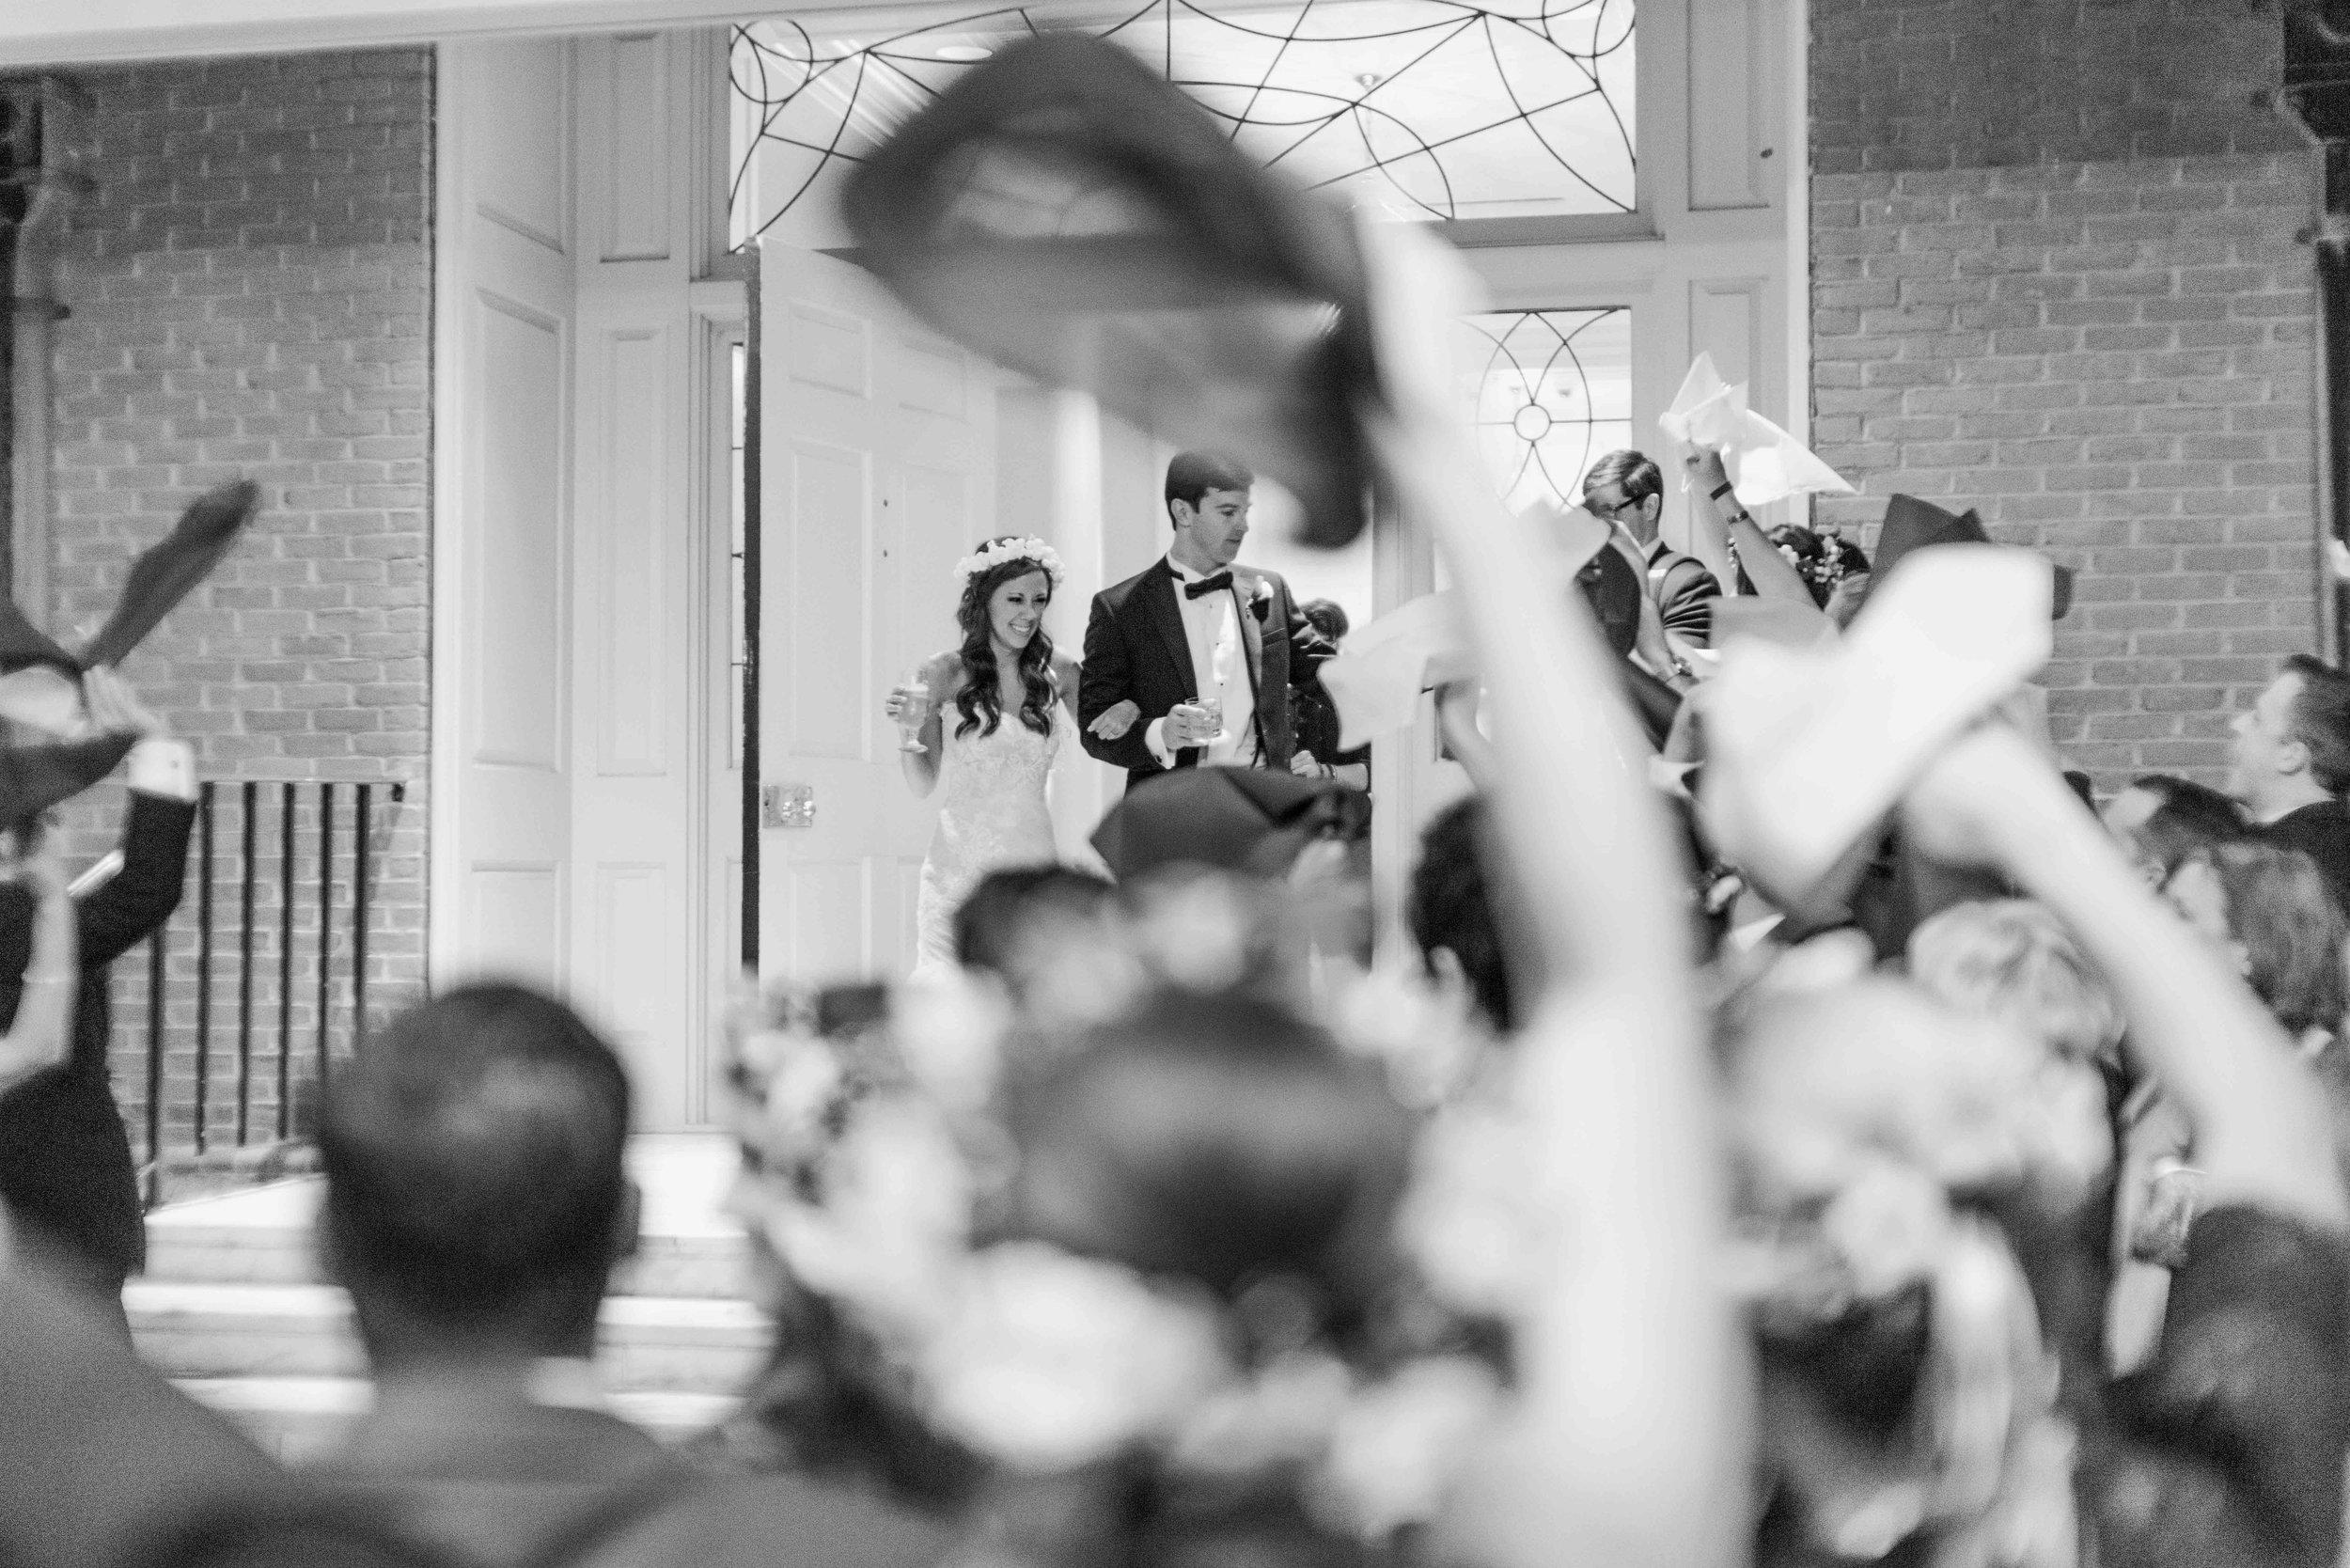 St.-Philip-Presbyterian-Church-Houston-Wedding-Ceremony-The-Junior-League-Of-Houston-Reception-Dana-Fernandez-Photography-Fine-Art-Film-39.jpg